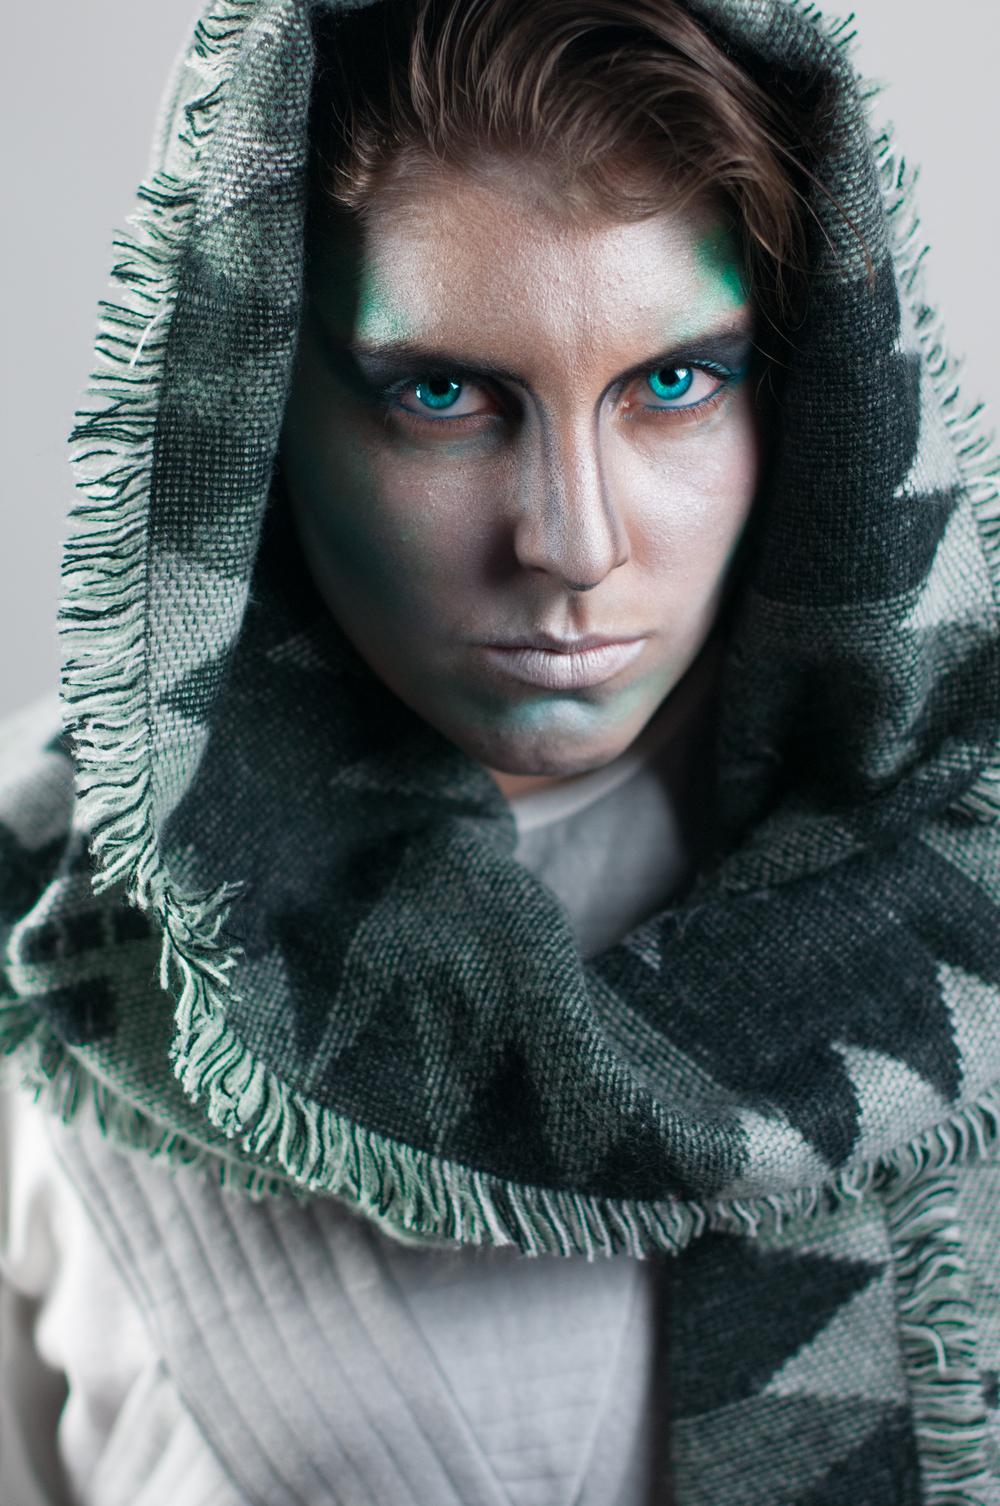 Devan (as Alien) #1